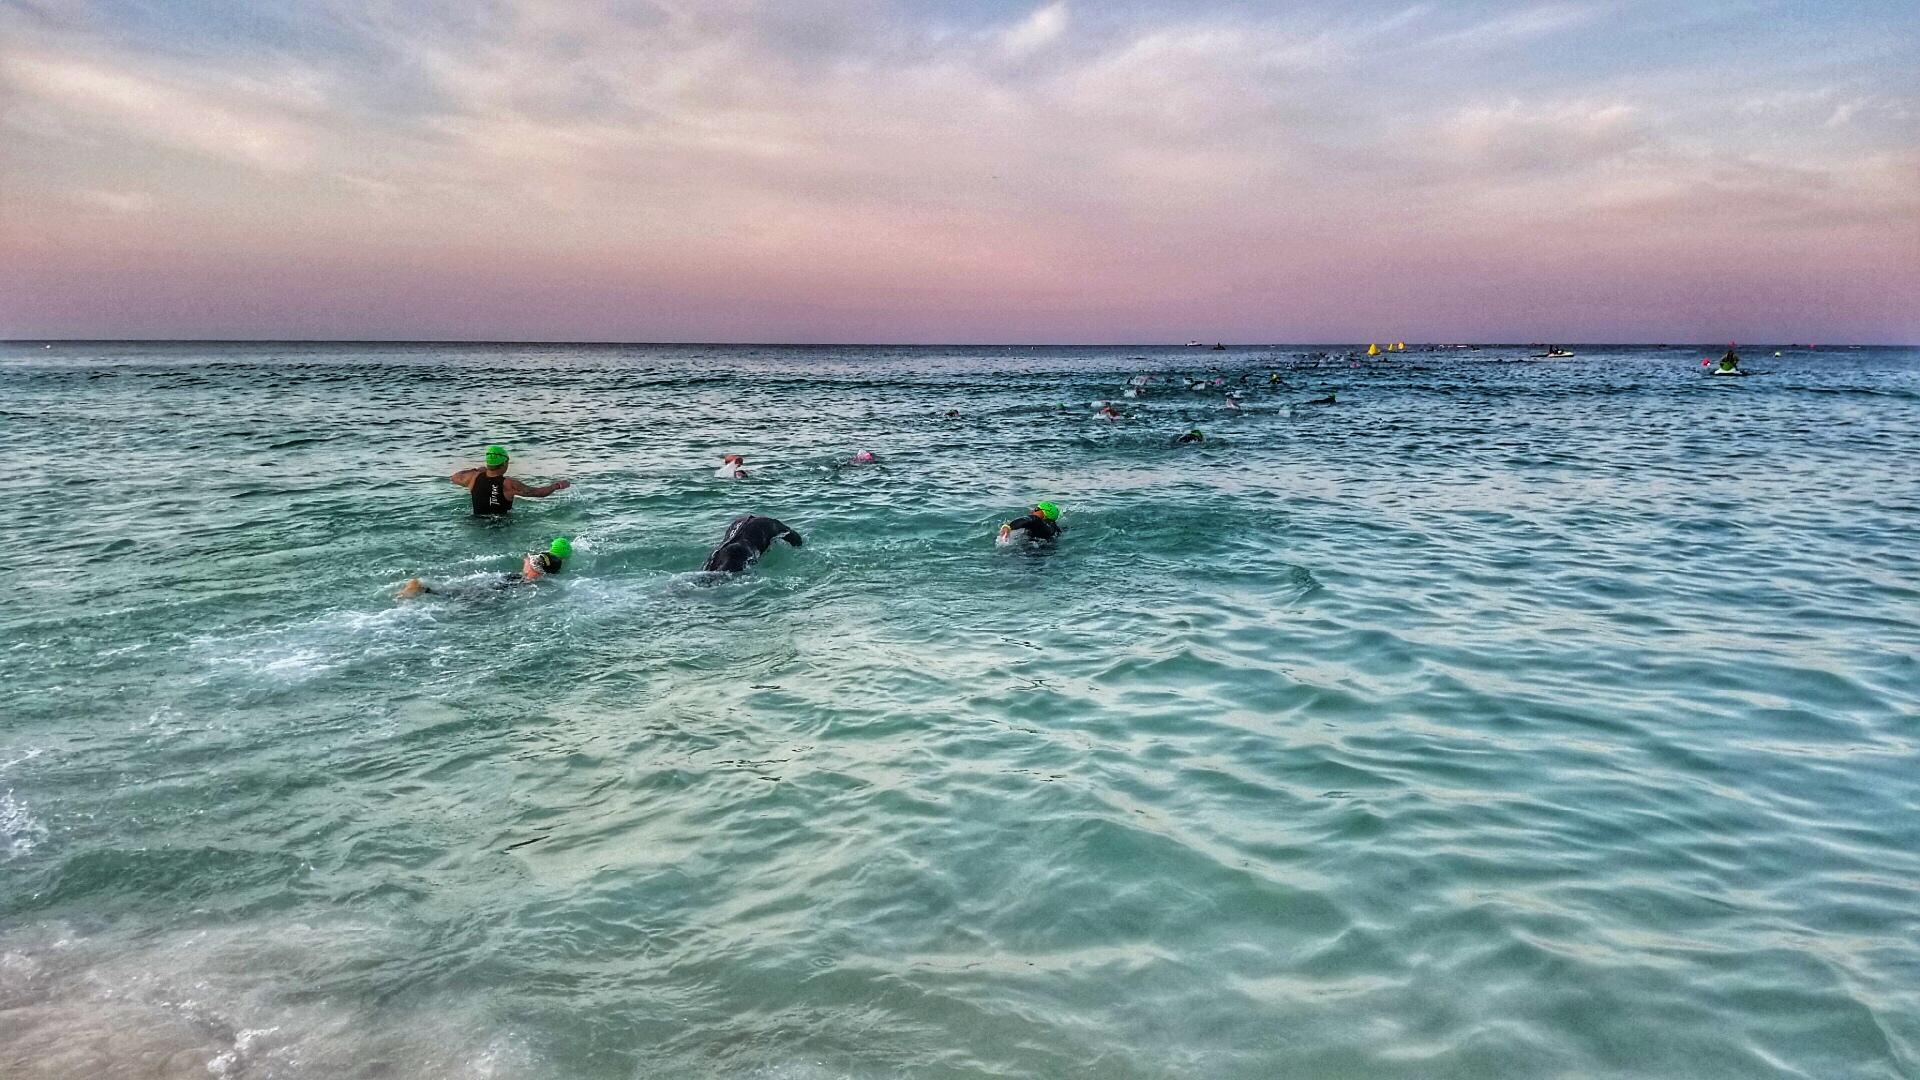 Coach_Terry_Wilson_Craig_Clark_Ironman_Gulf_Coast_70.3_Swim.JPG